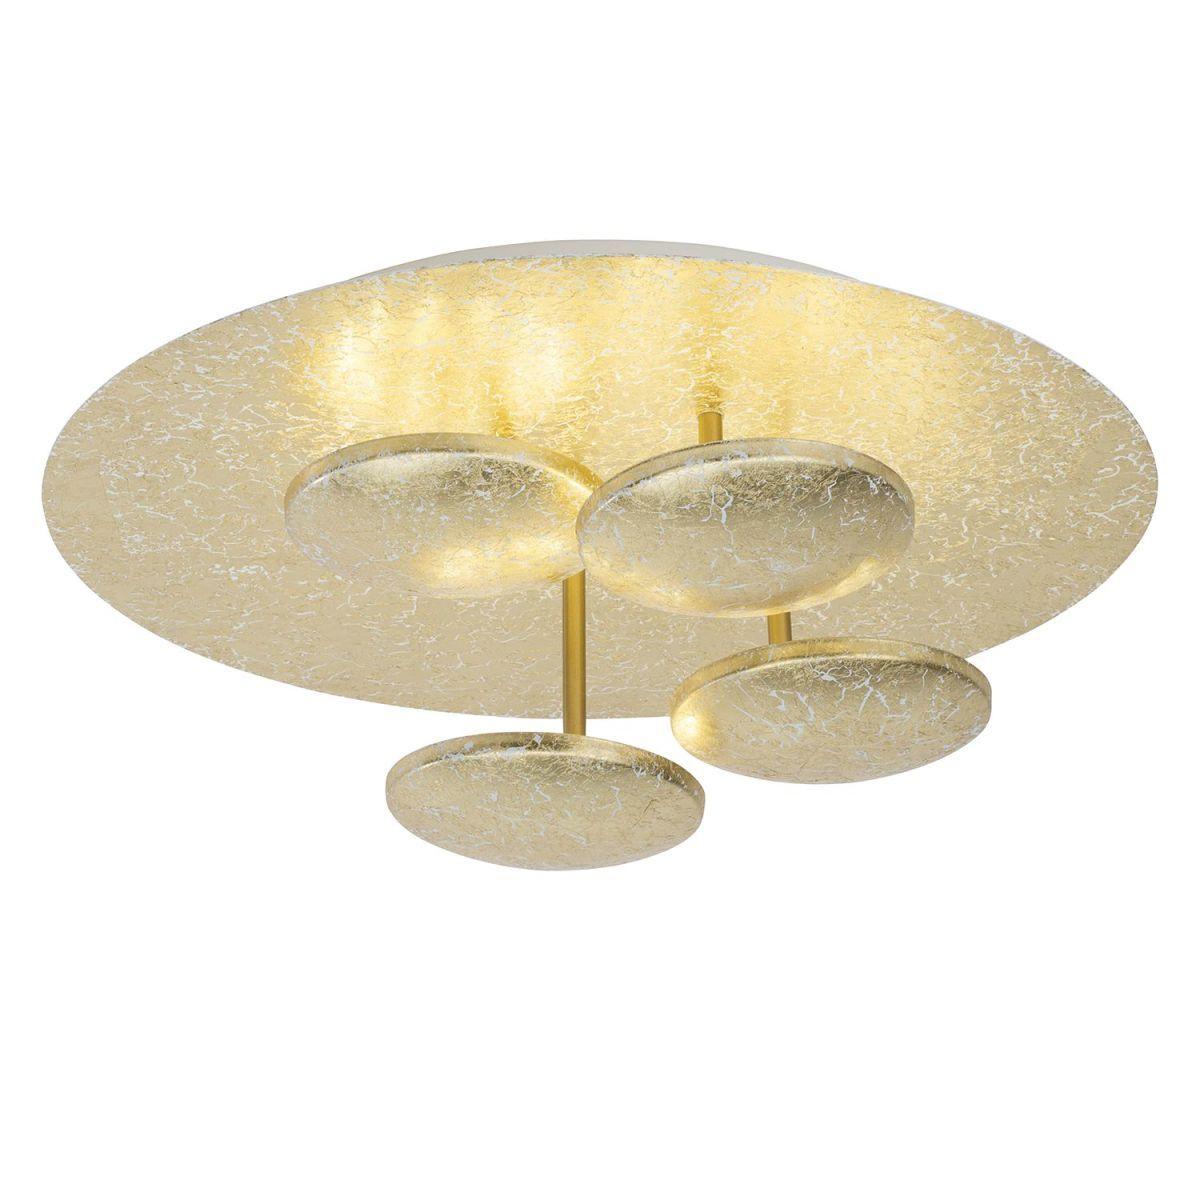 EEK A+, LED-Deckenleuchte Pharaoh - Eisen - 4-flammig - Gold ...